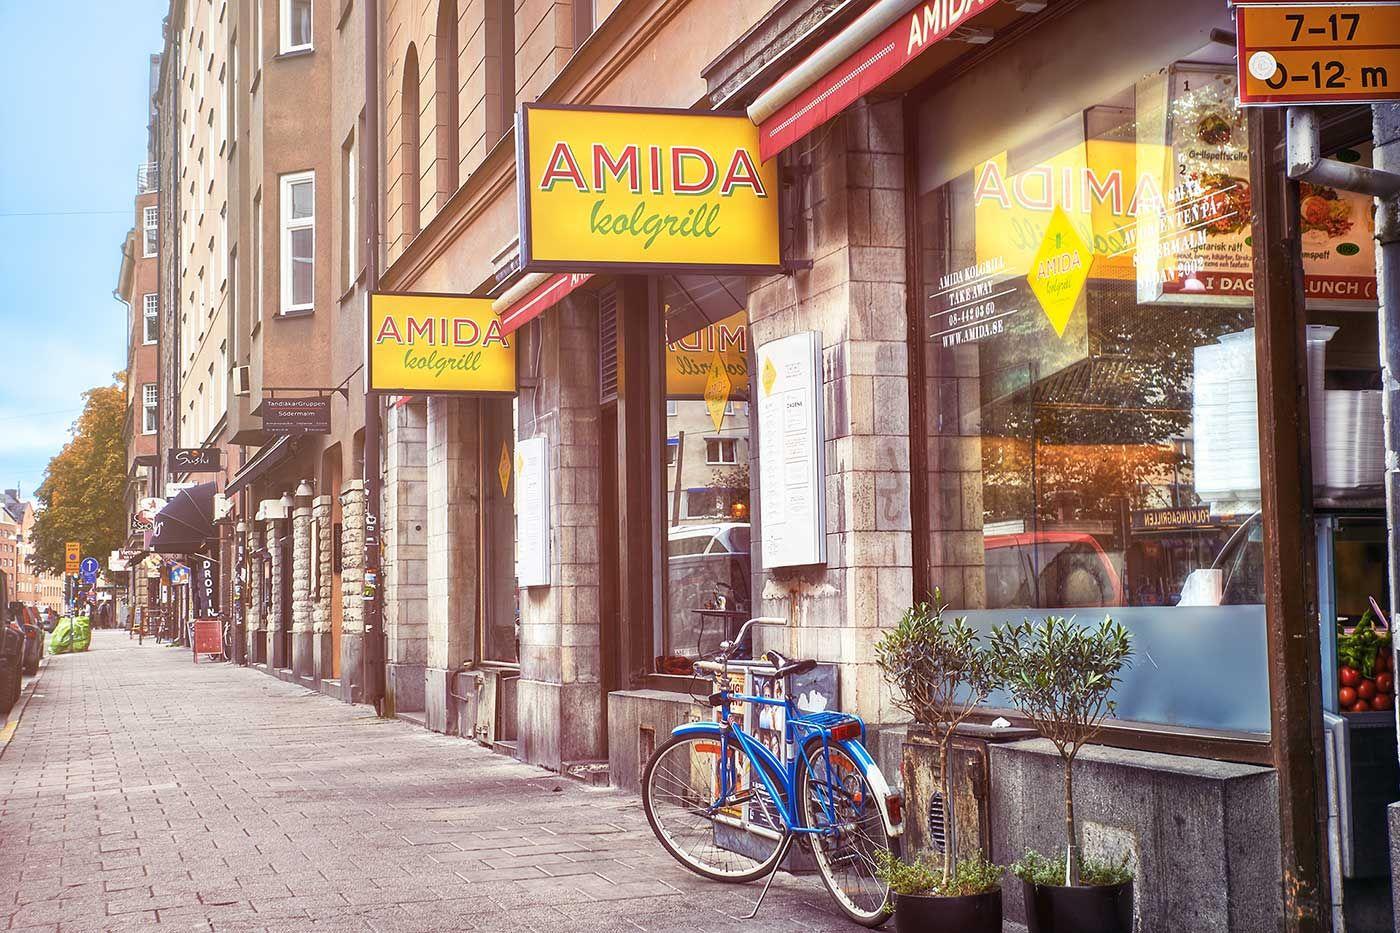 Amida i Södermalm, Kungens Kurva, Sollentuna & Sundbyberg